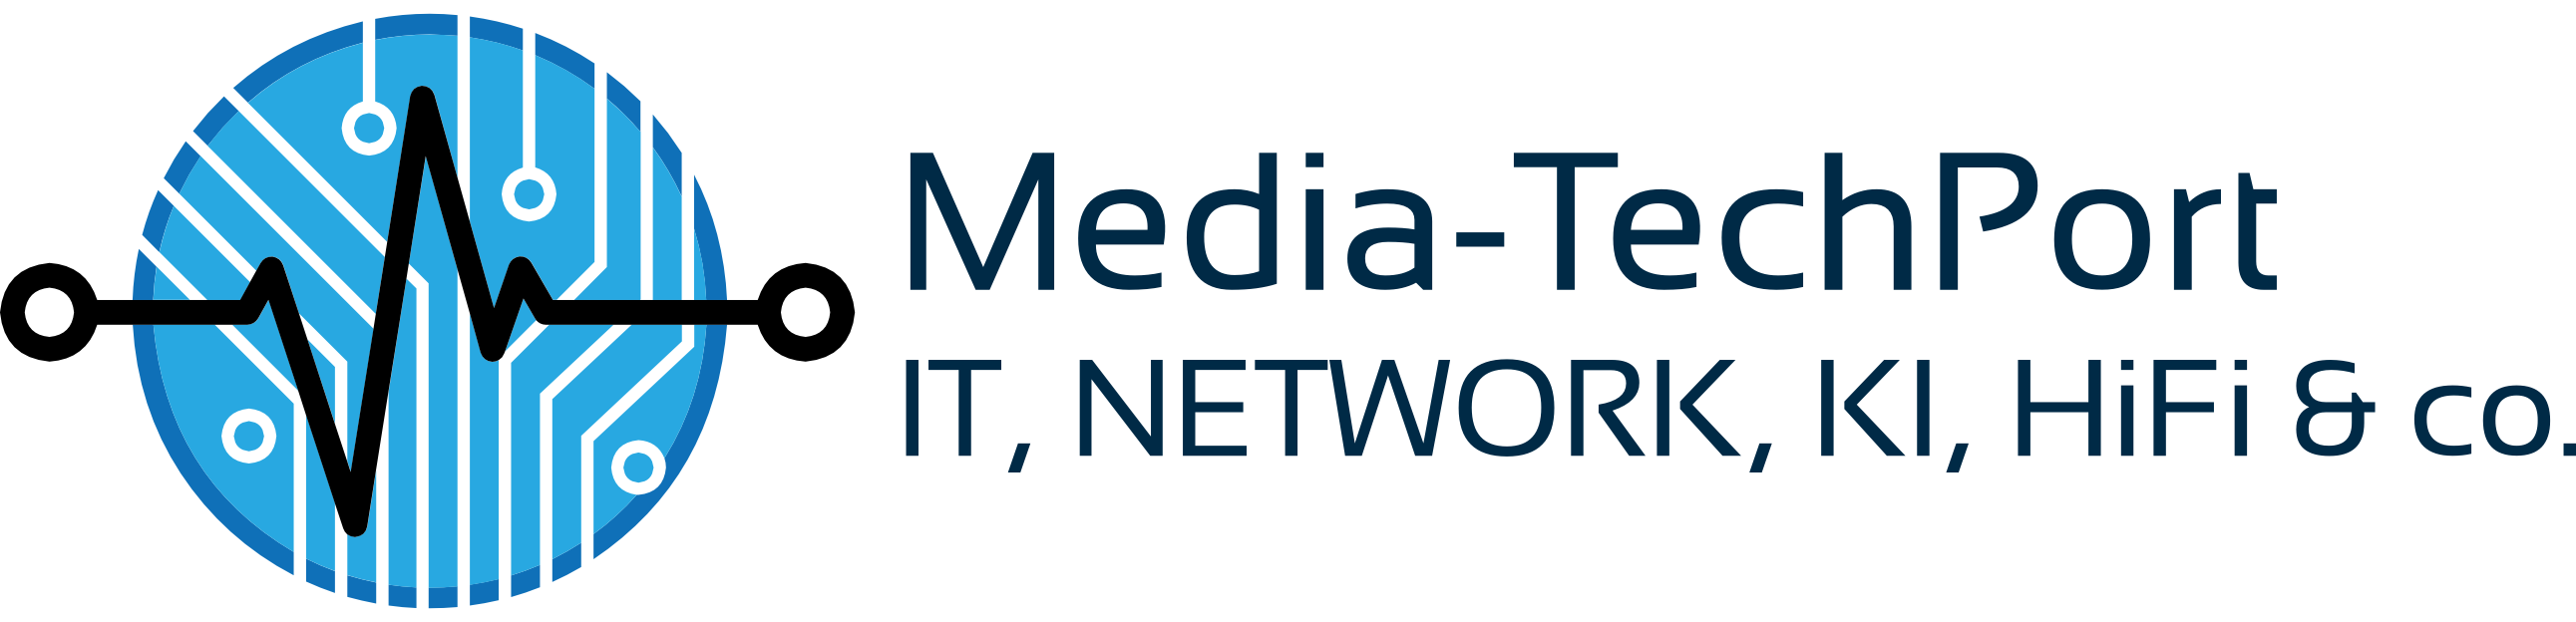 Media-TechPort